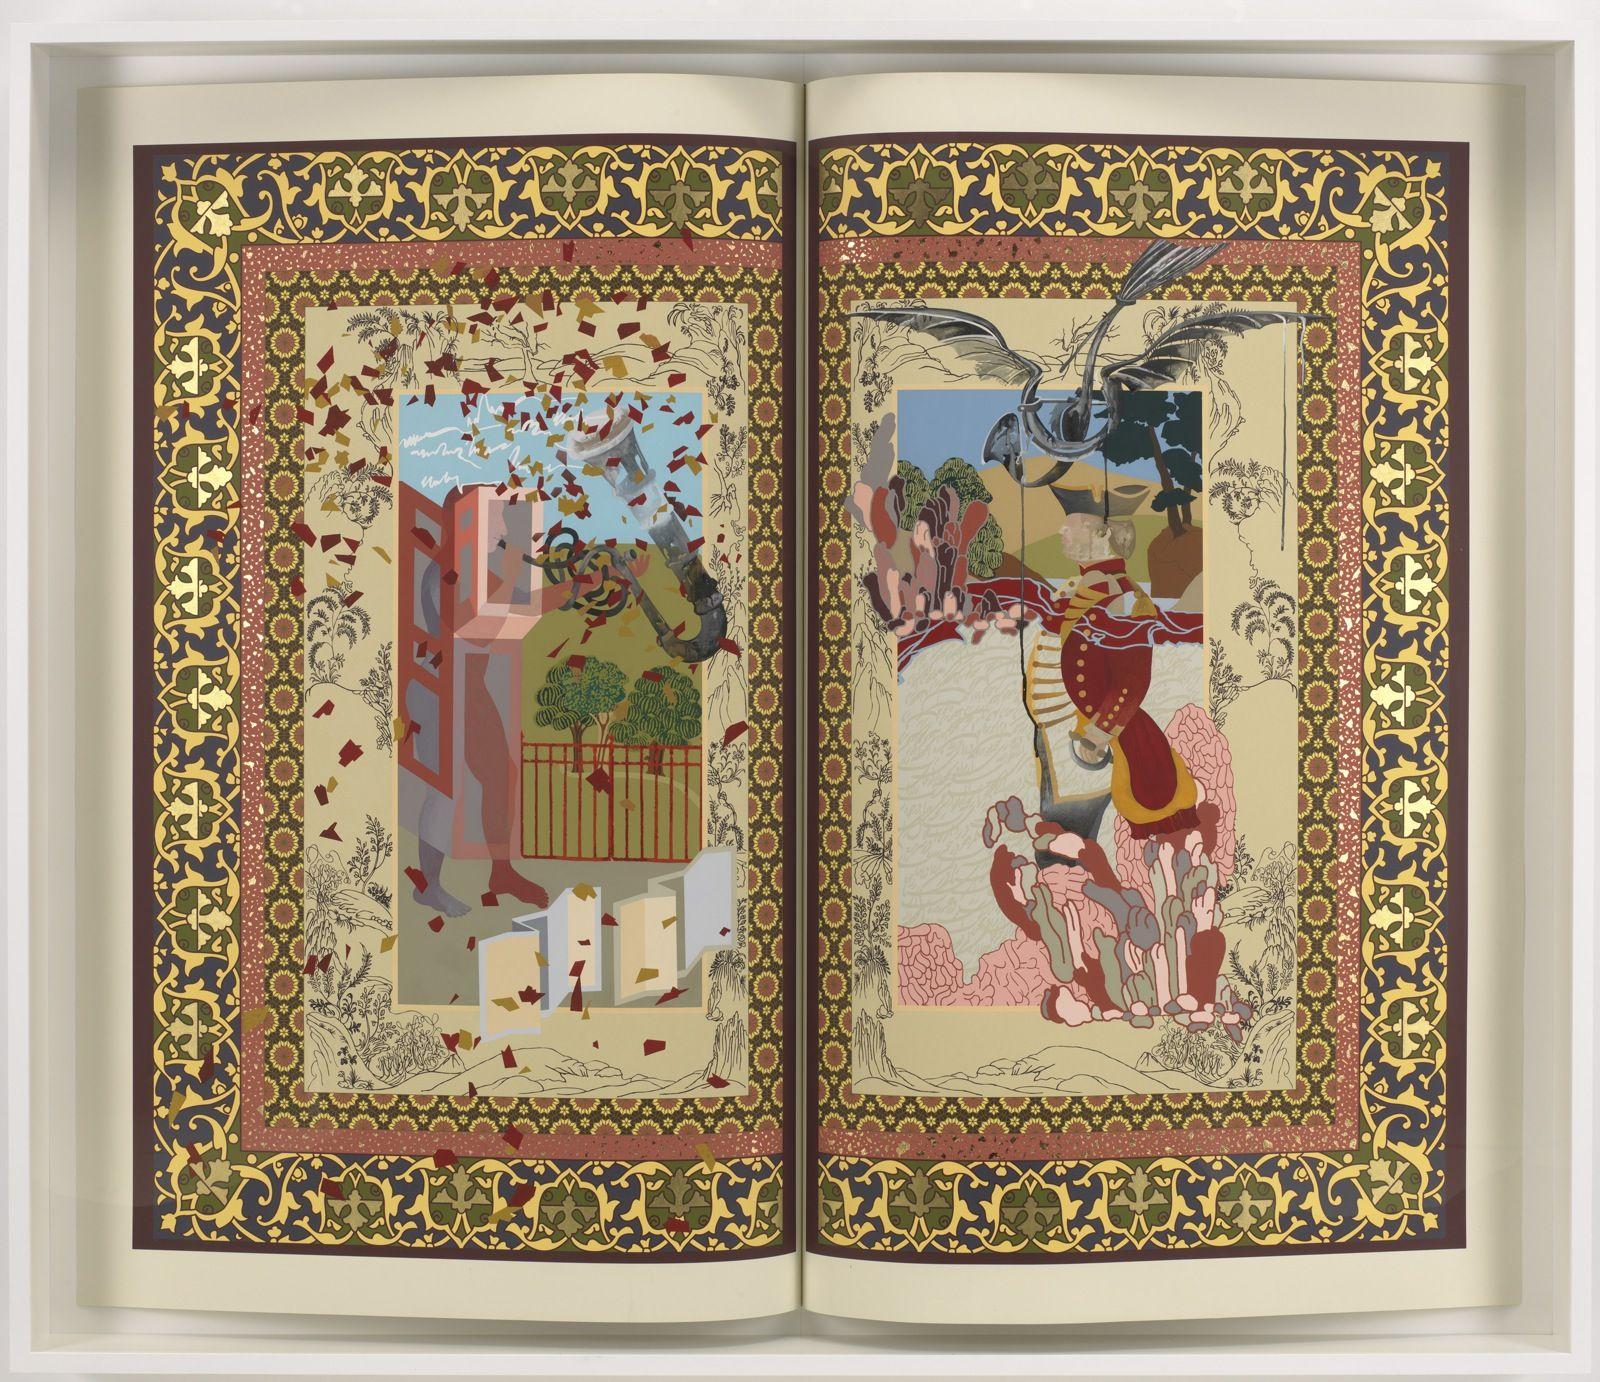 Shahzia Sikander Pilar Corrias The Explosion Of Company Man Mini Pomade Hiroshi 22 Gr Artist